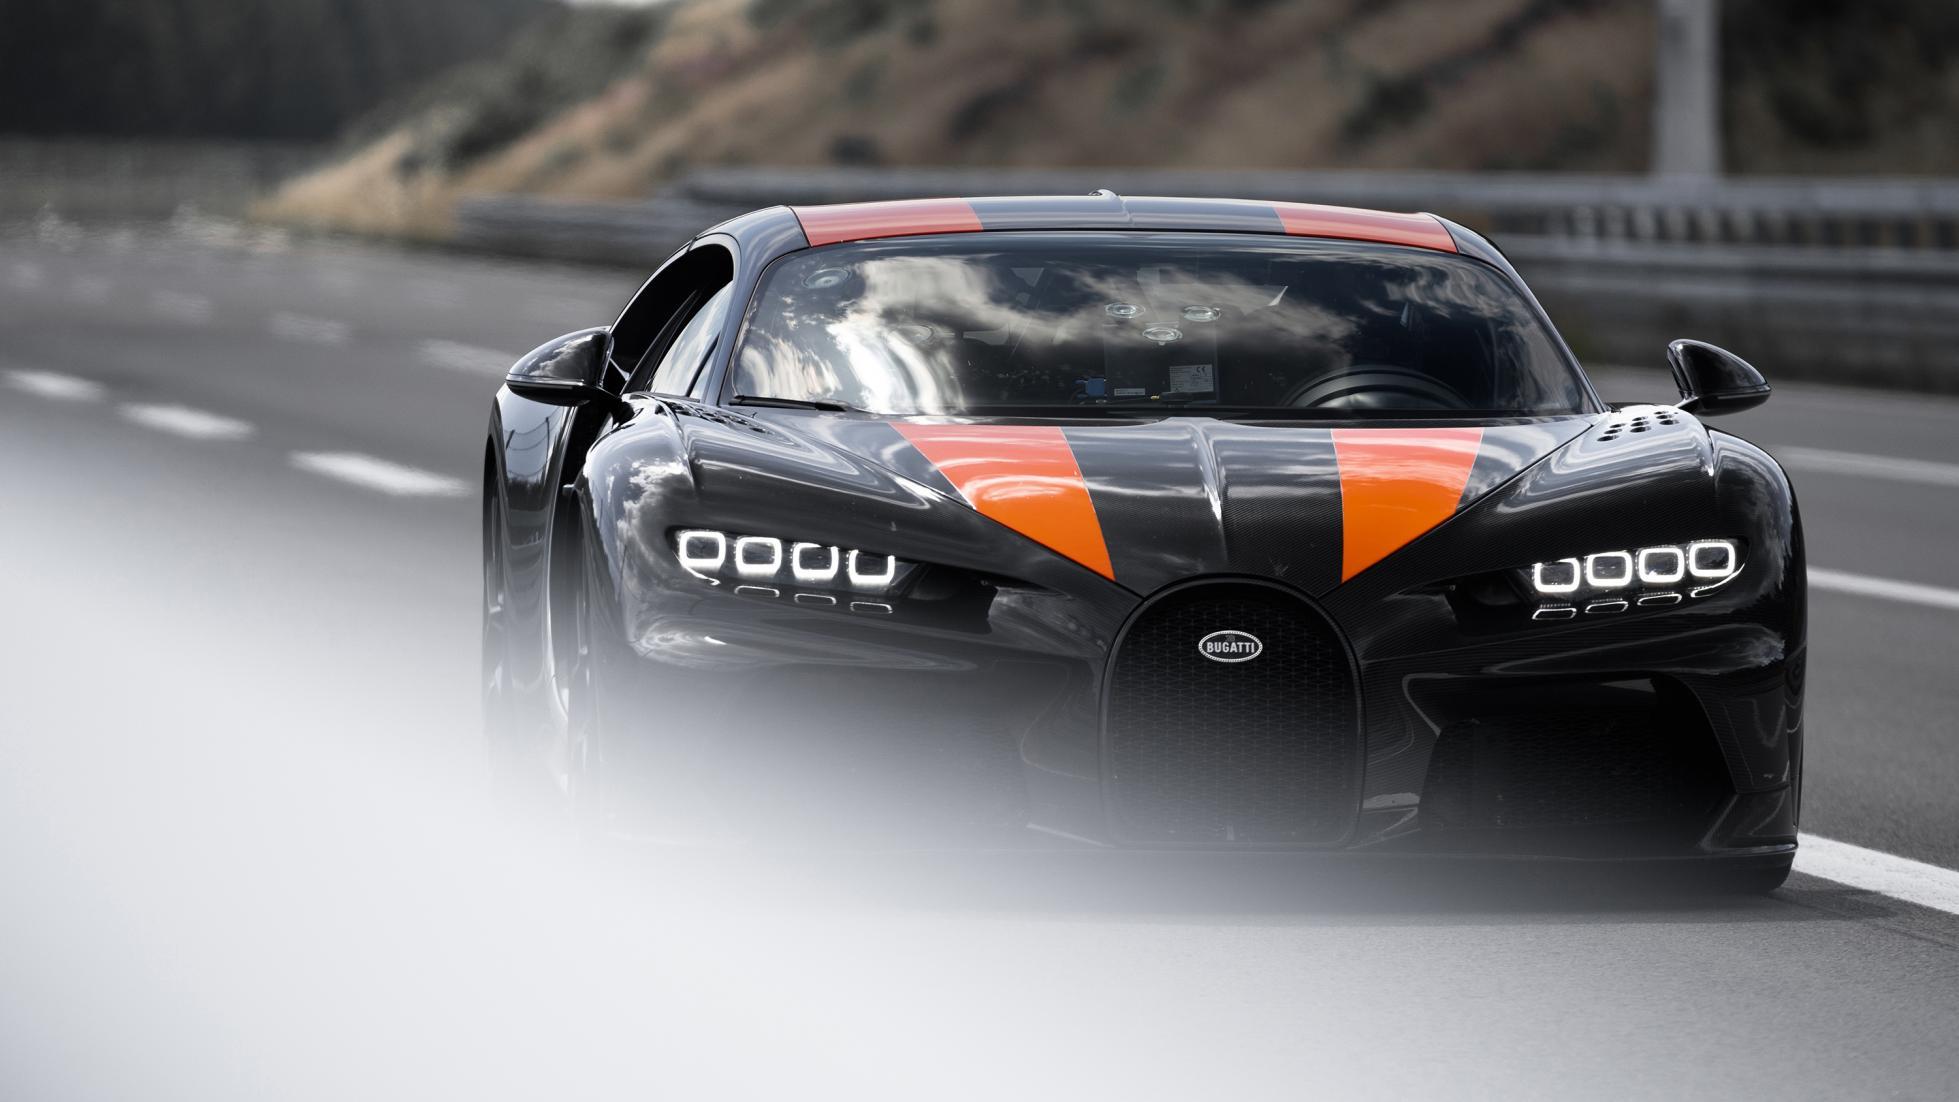 Bugatti-Chiron-Speed-record-3